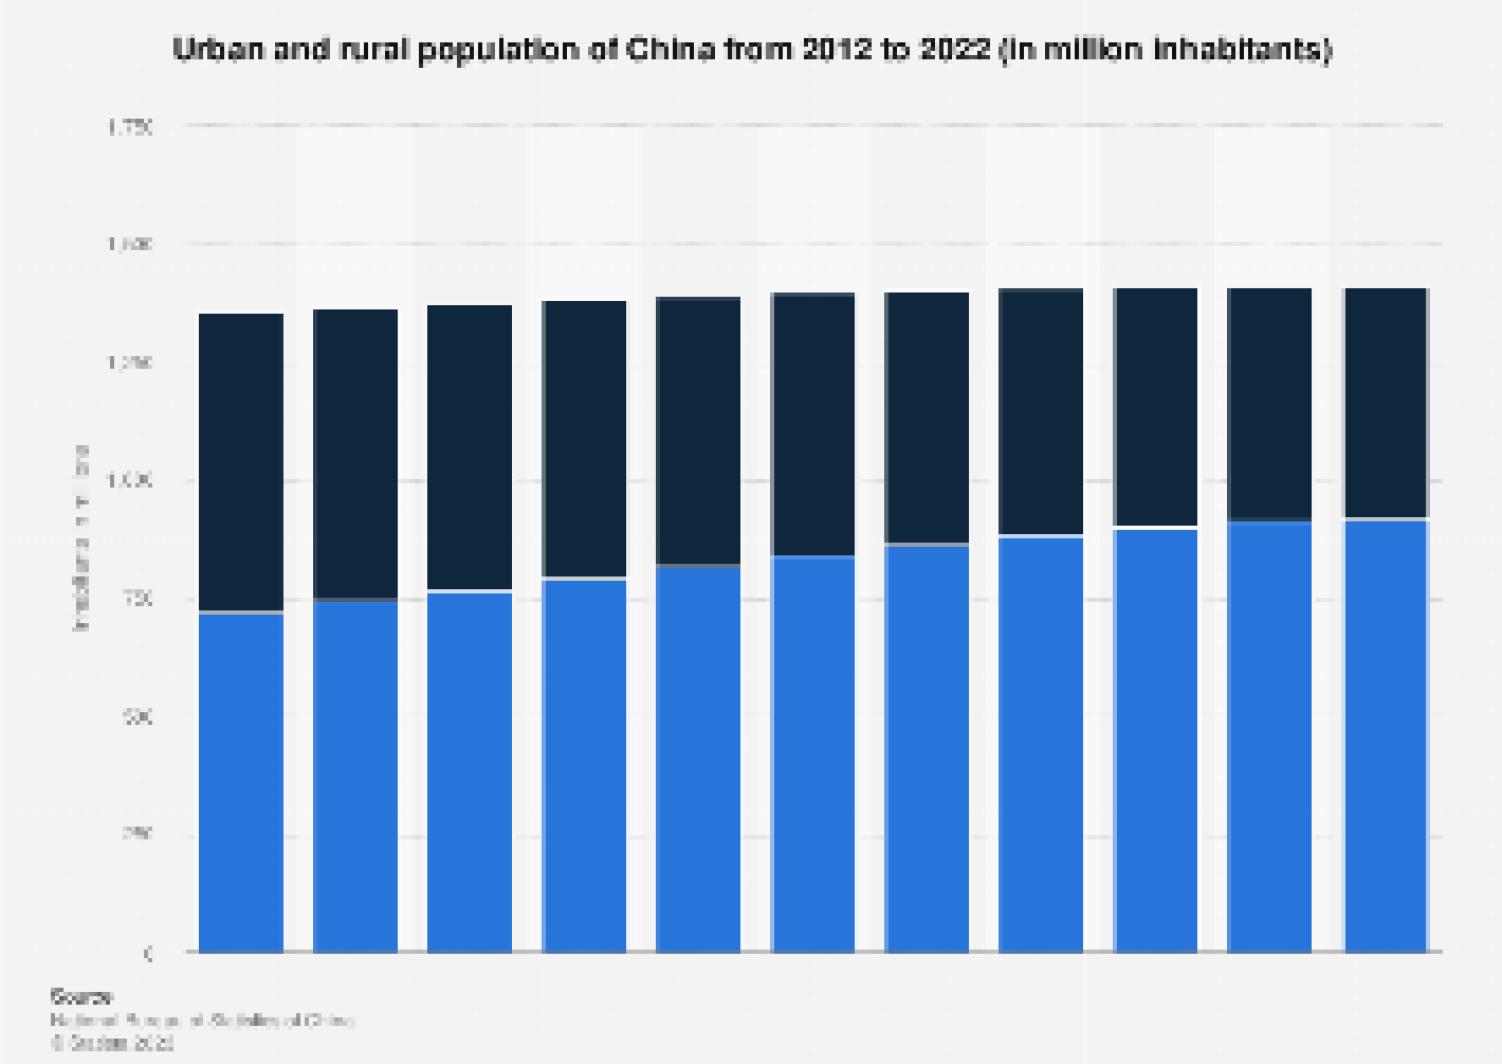 China Urban And Rural Population Statista